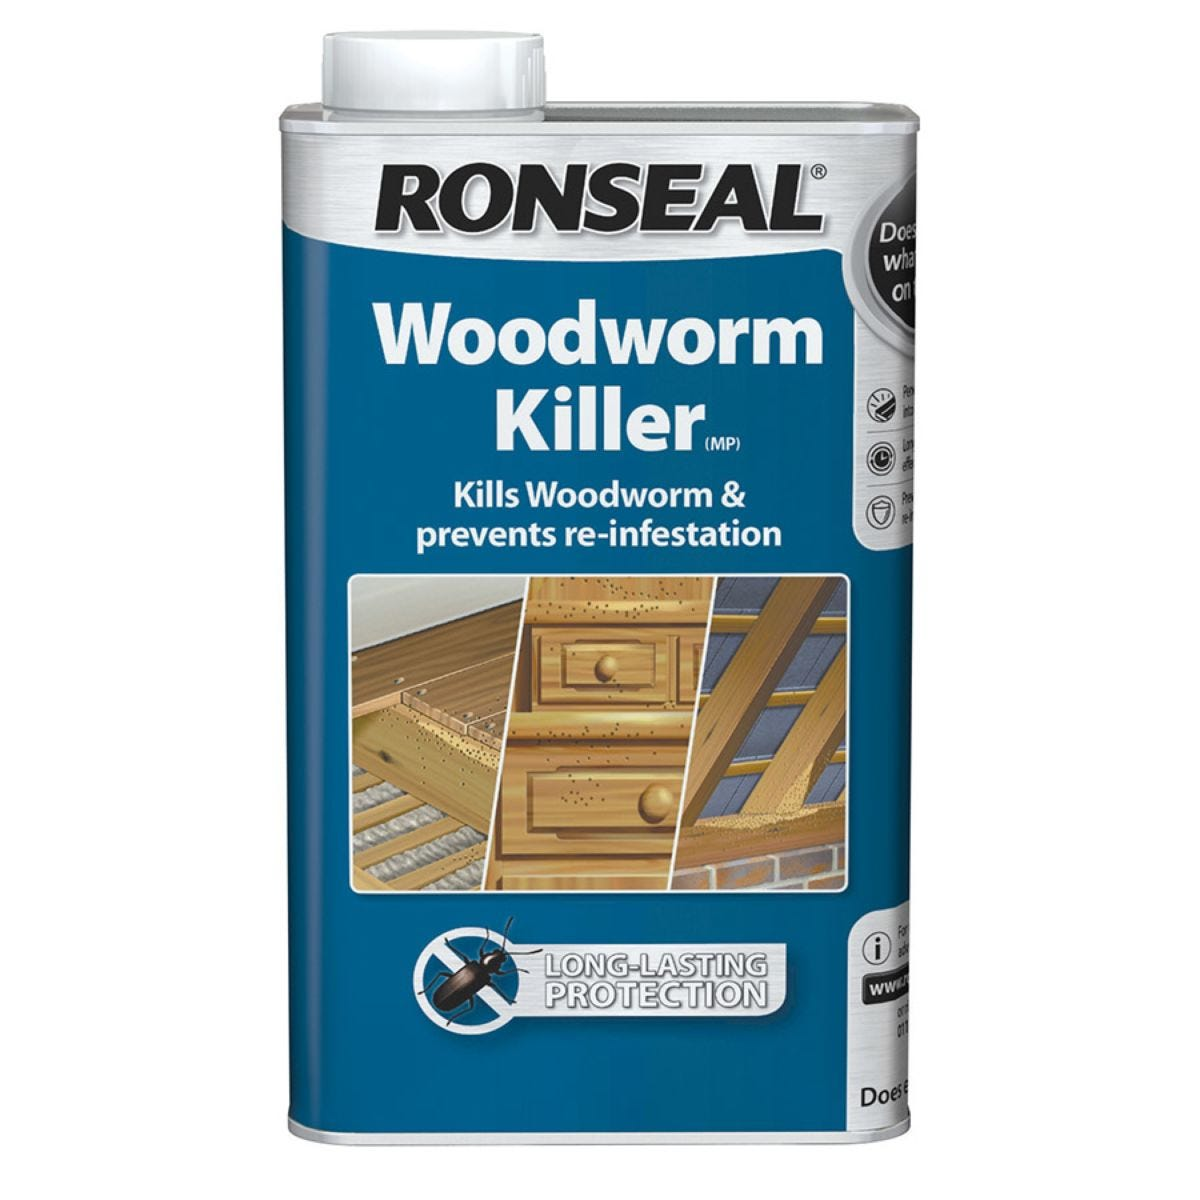 Ronseal Wood Worm Killer